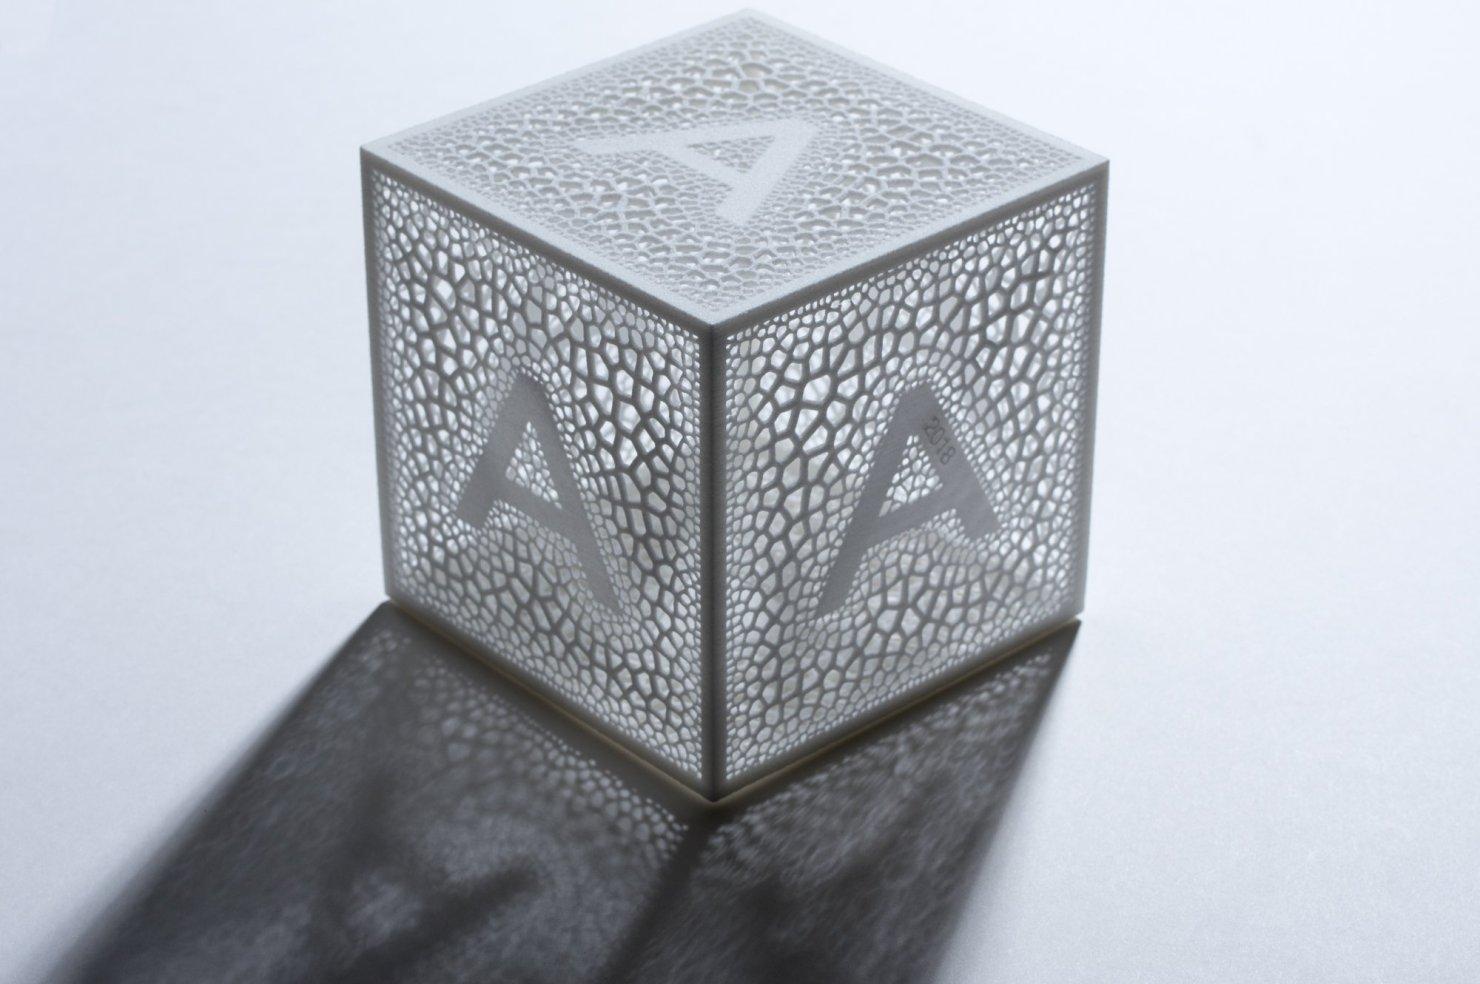 Automattic Design Award